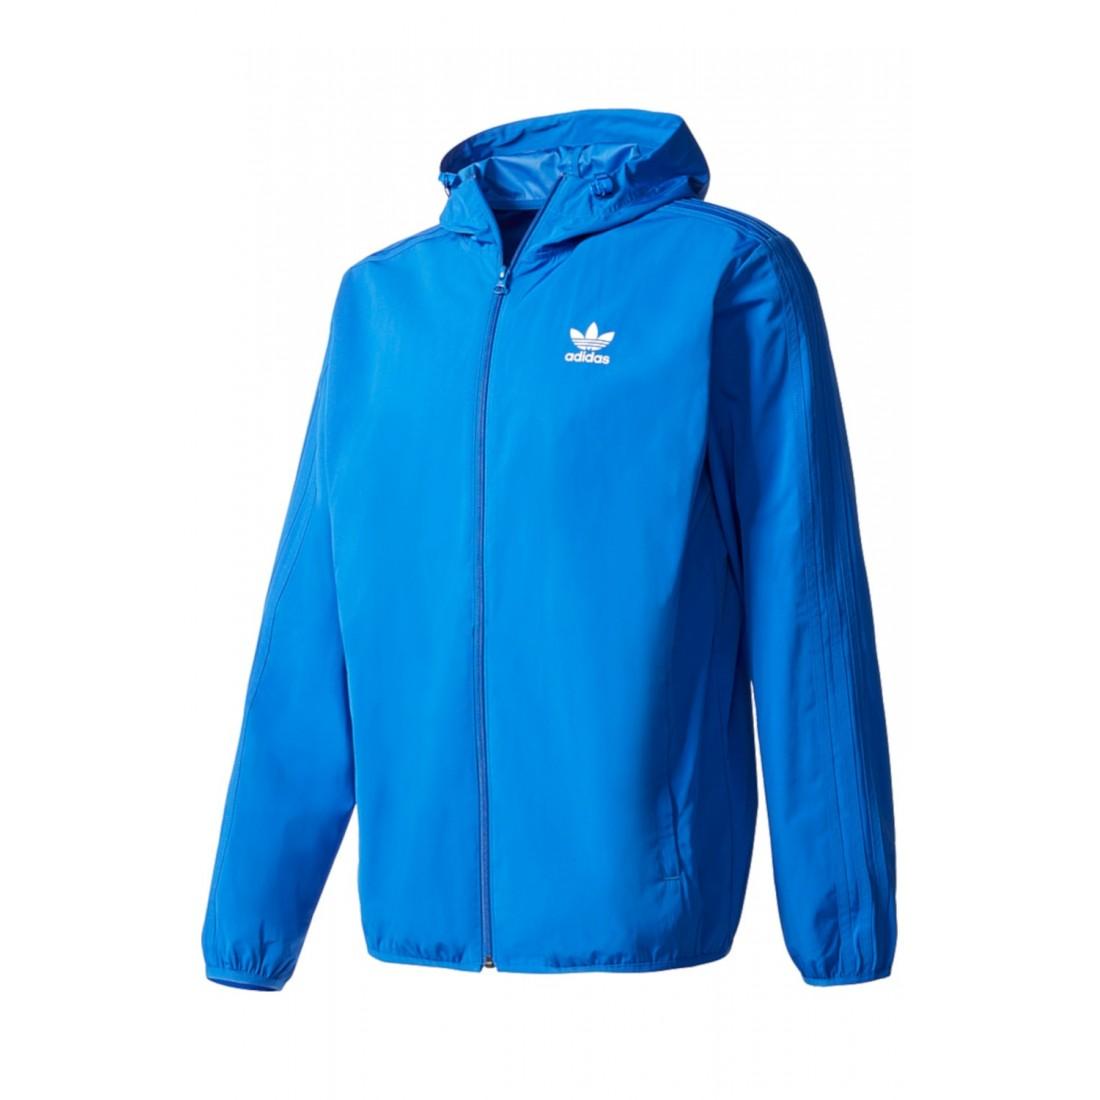 BK0031 Niebieski